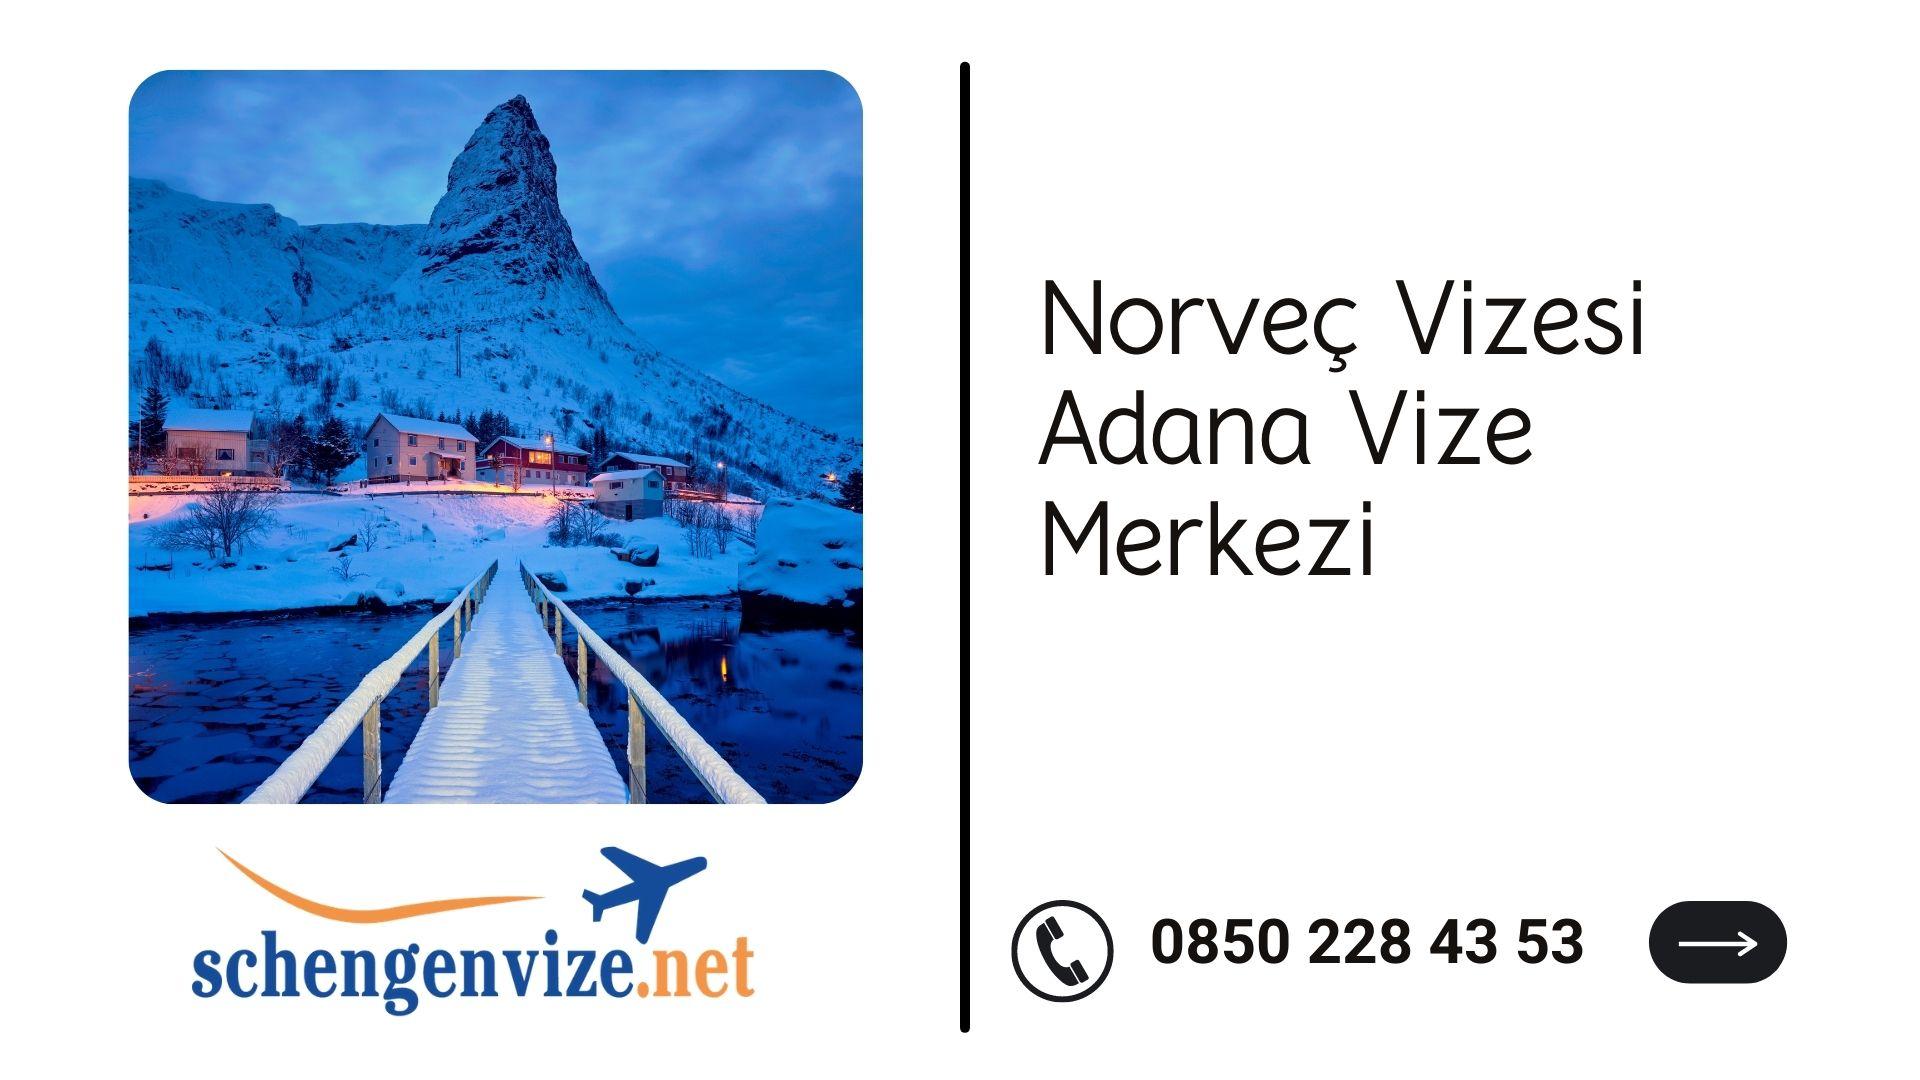 Norveç Vizesi Adana Vize Merkezi